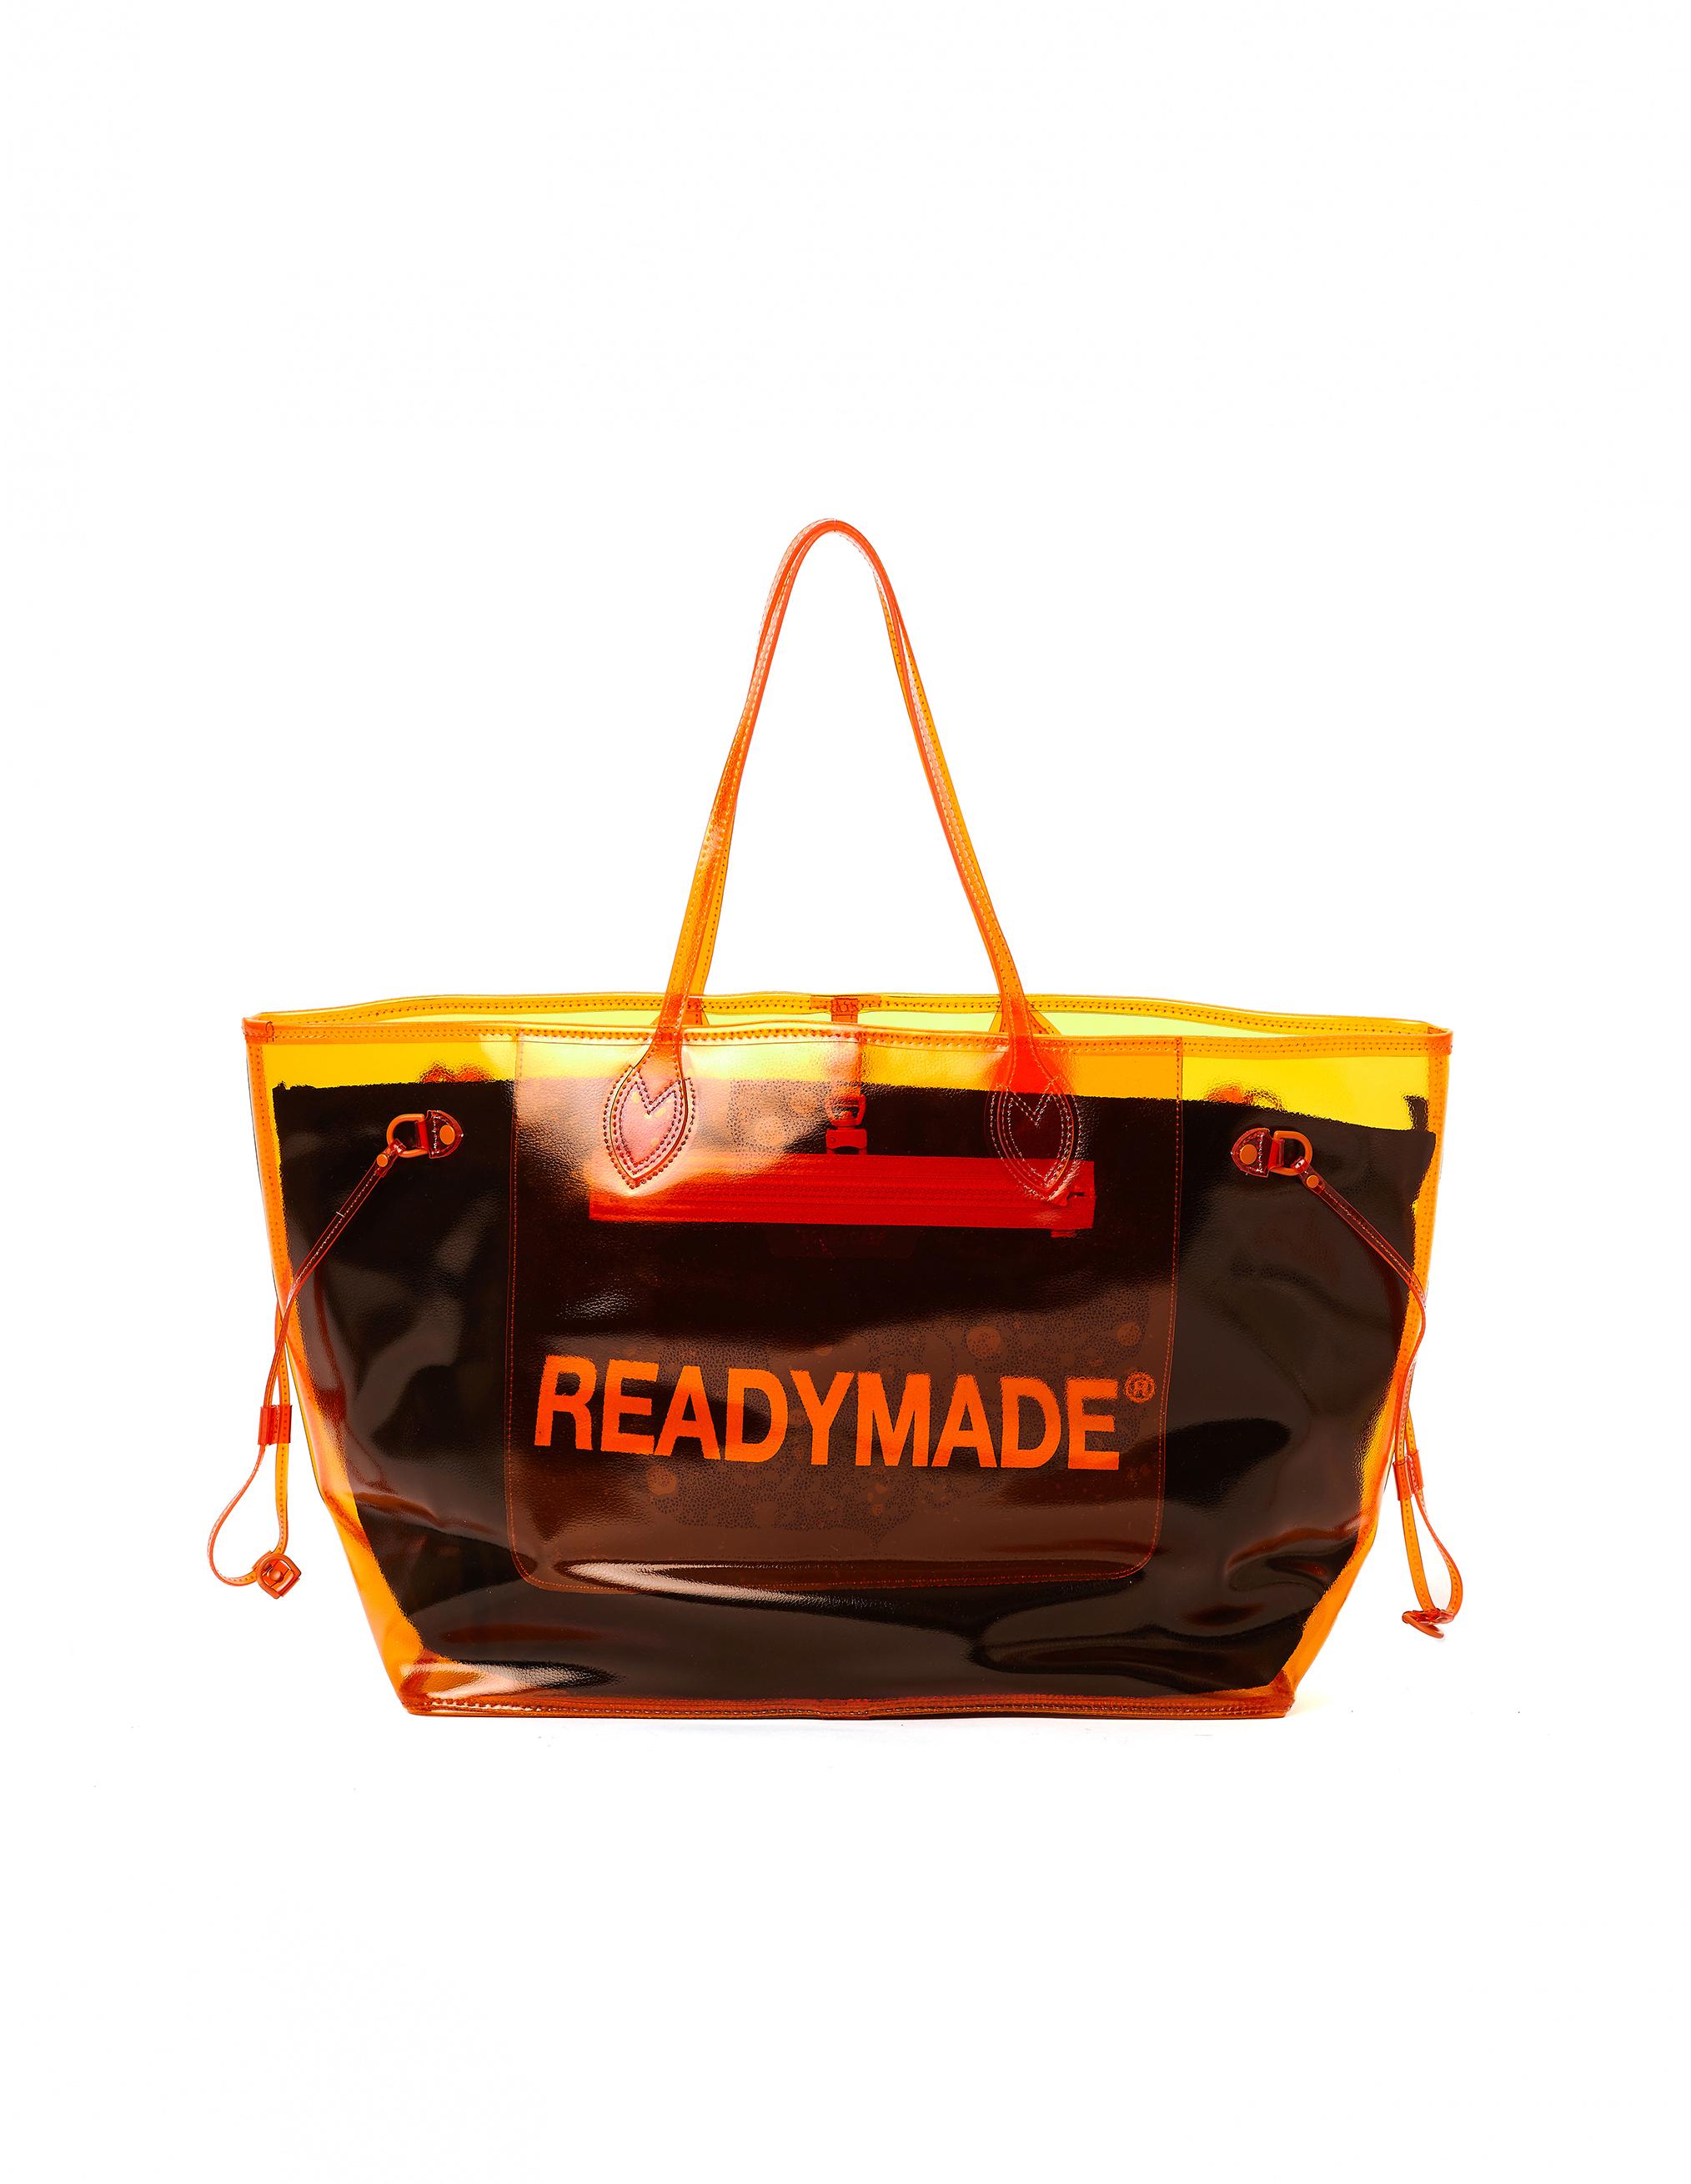 Readymade Orange Transparent Roomy Bag